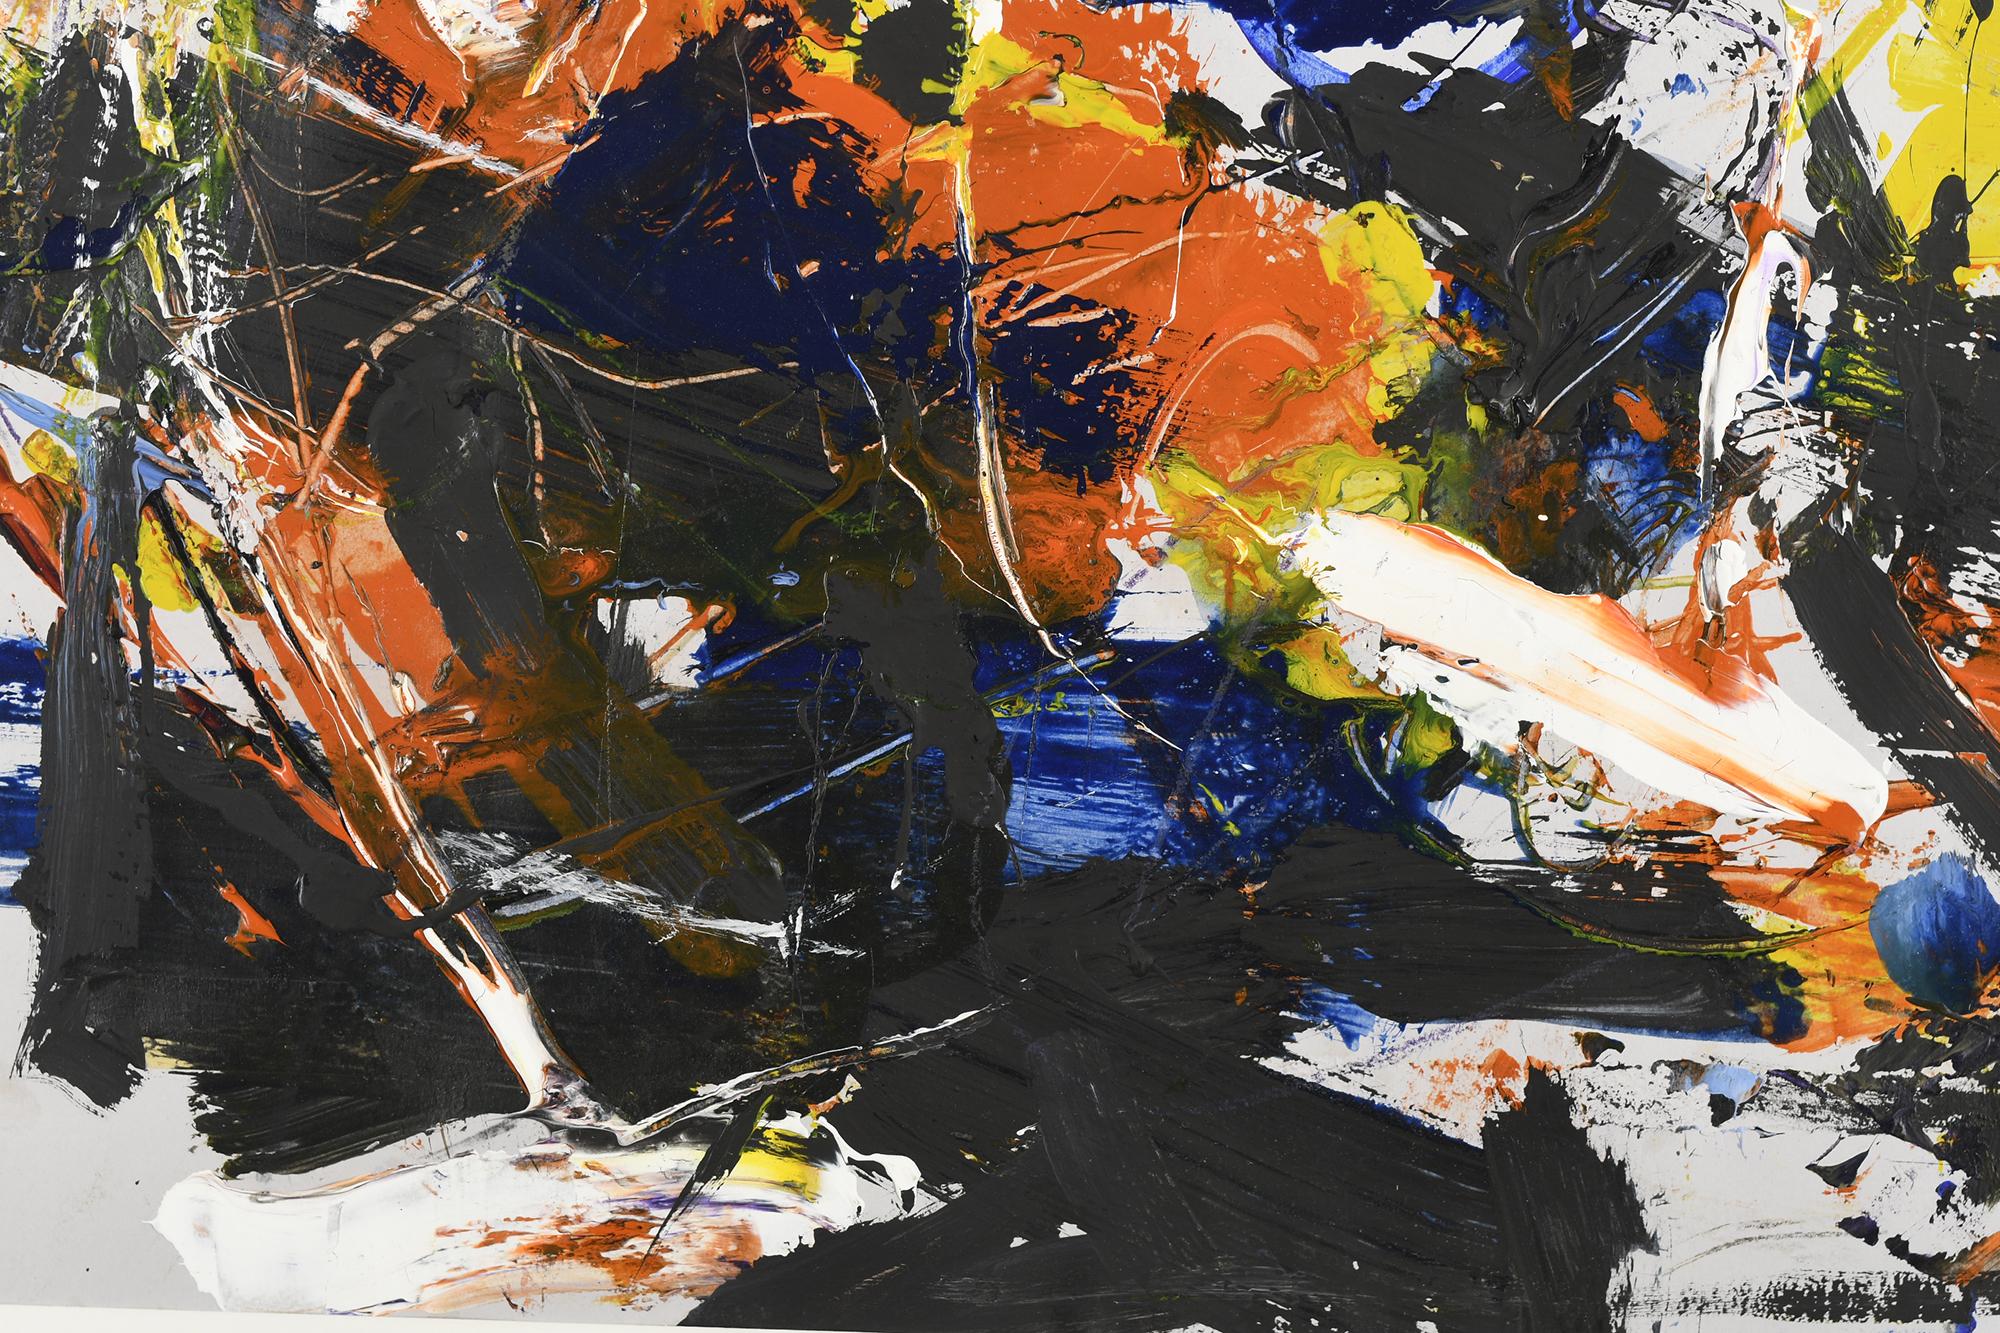 Original Painting by the Italian artist Armando Farina. - Image 6 of 8